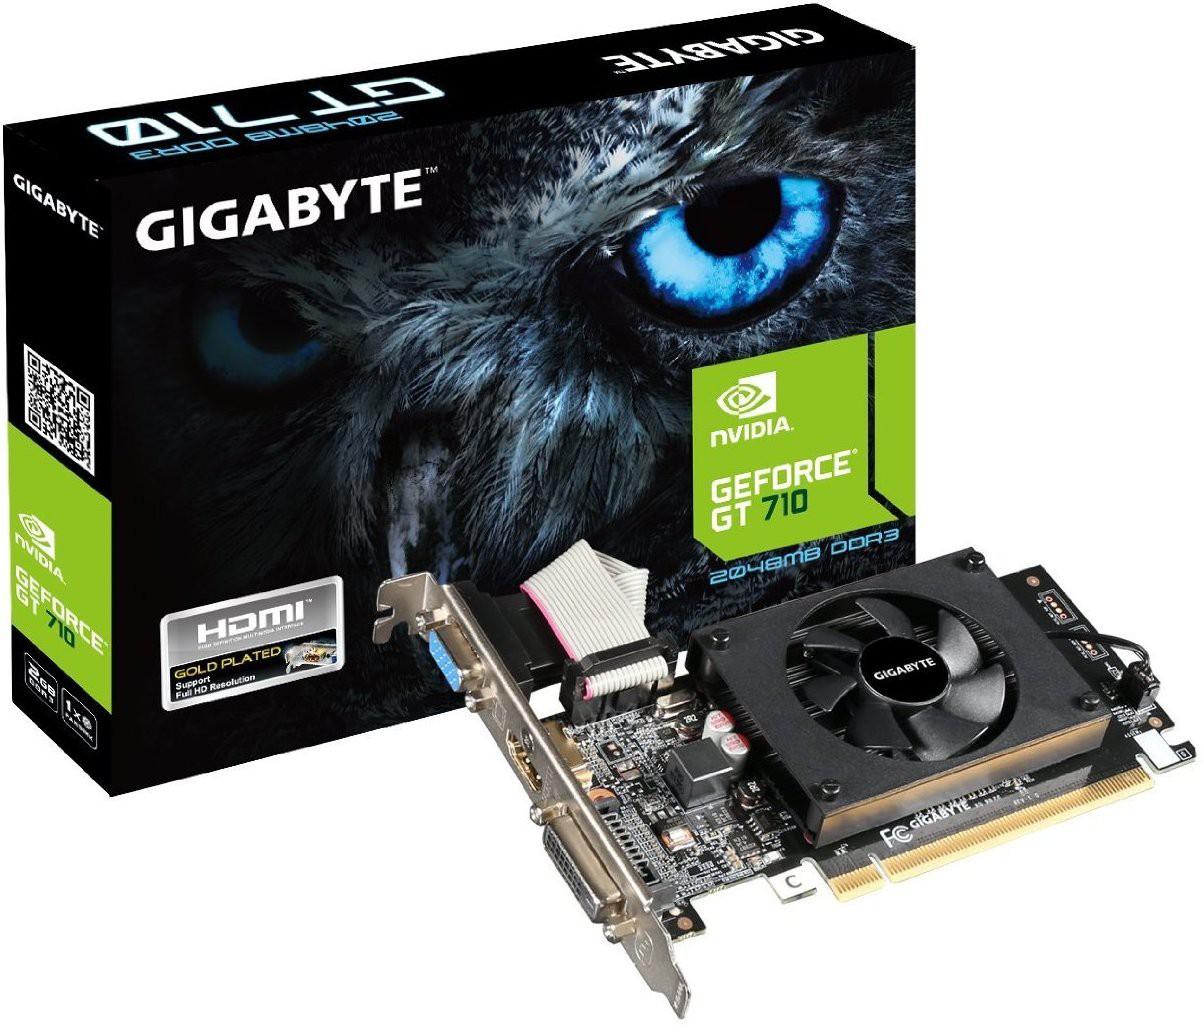 Gigabyte NVIDIA GeForce GT 710 2 GB DDR3 Graphics Card(Multicolor)